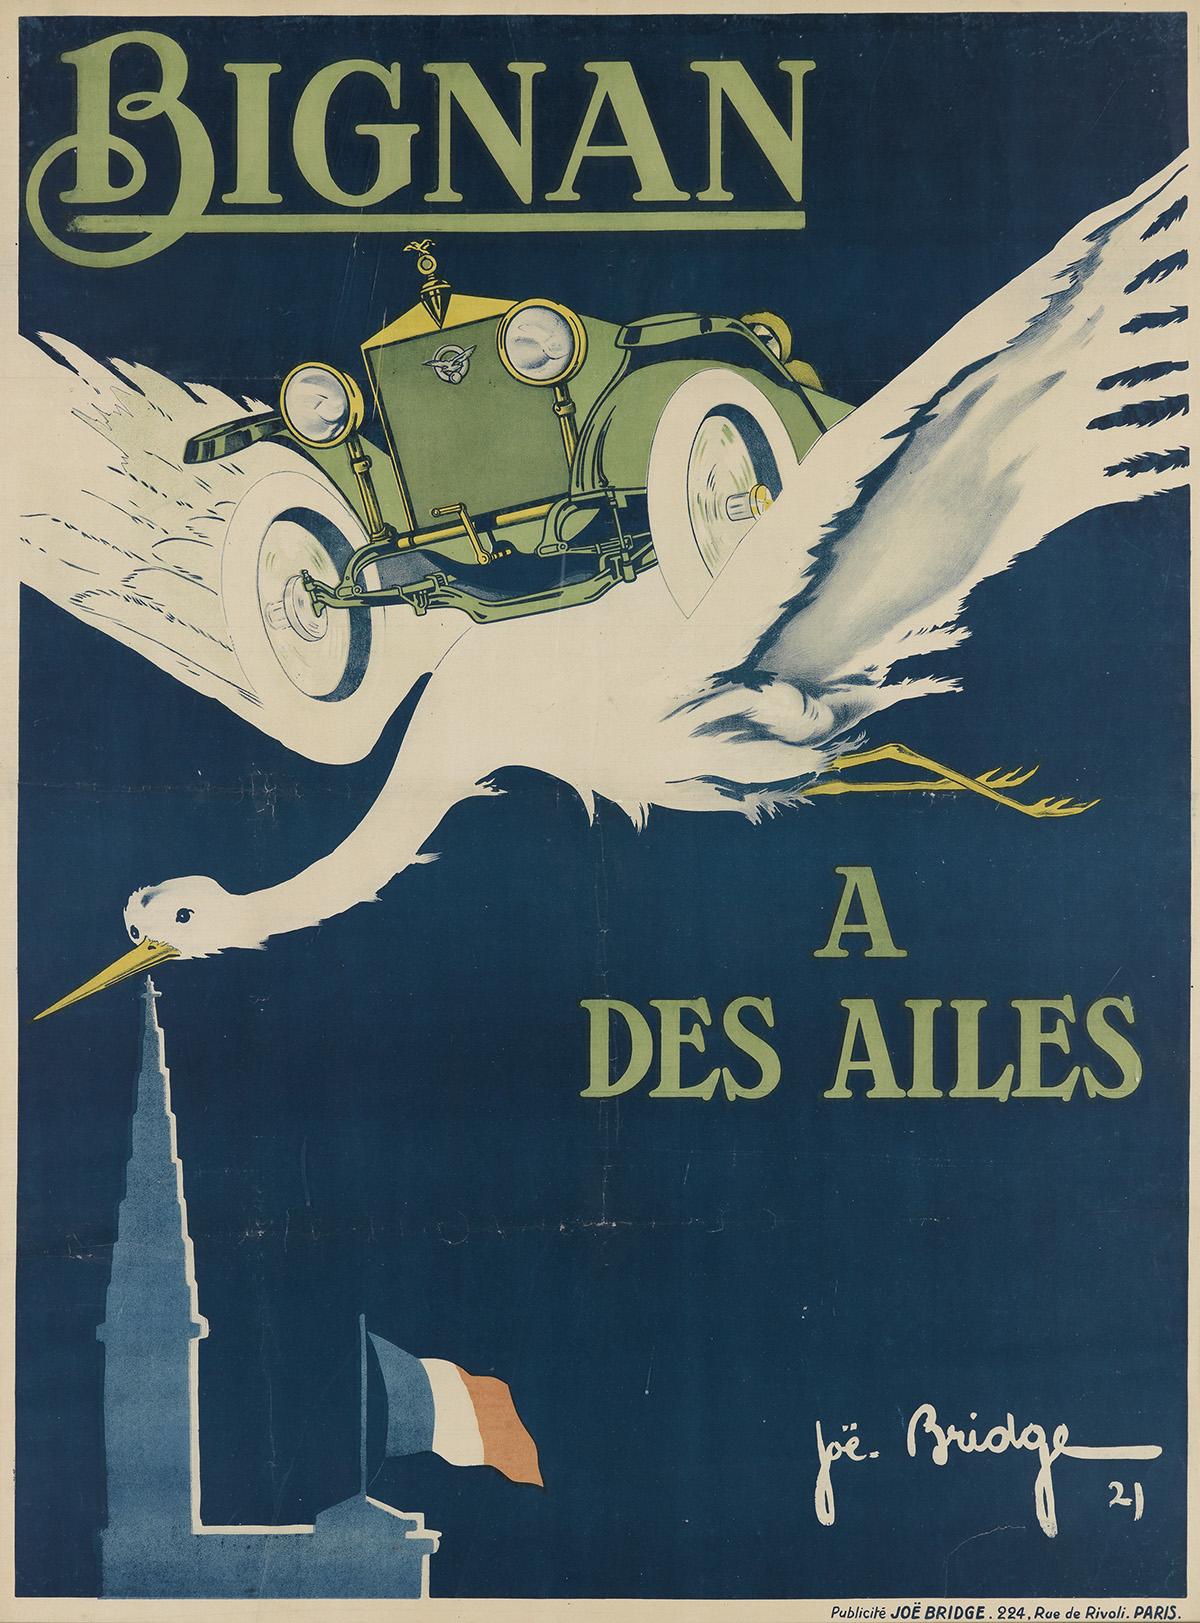 JOE-BRIDGE-(JEAN-BARREZ-1886-1967)-BIGNAN--A-DES-AILES-1921-